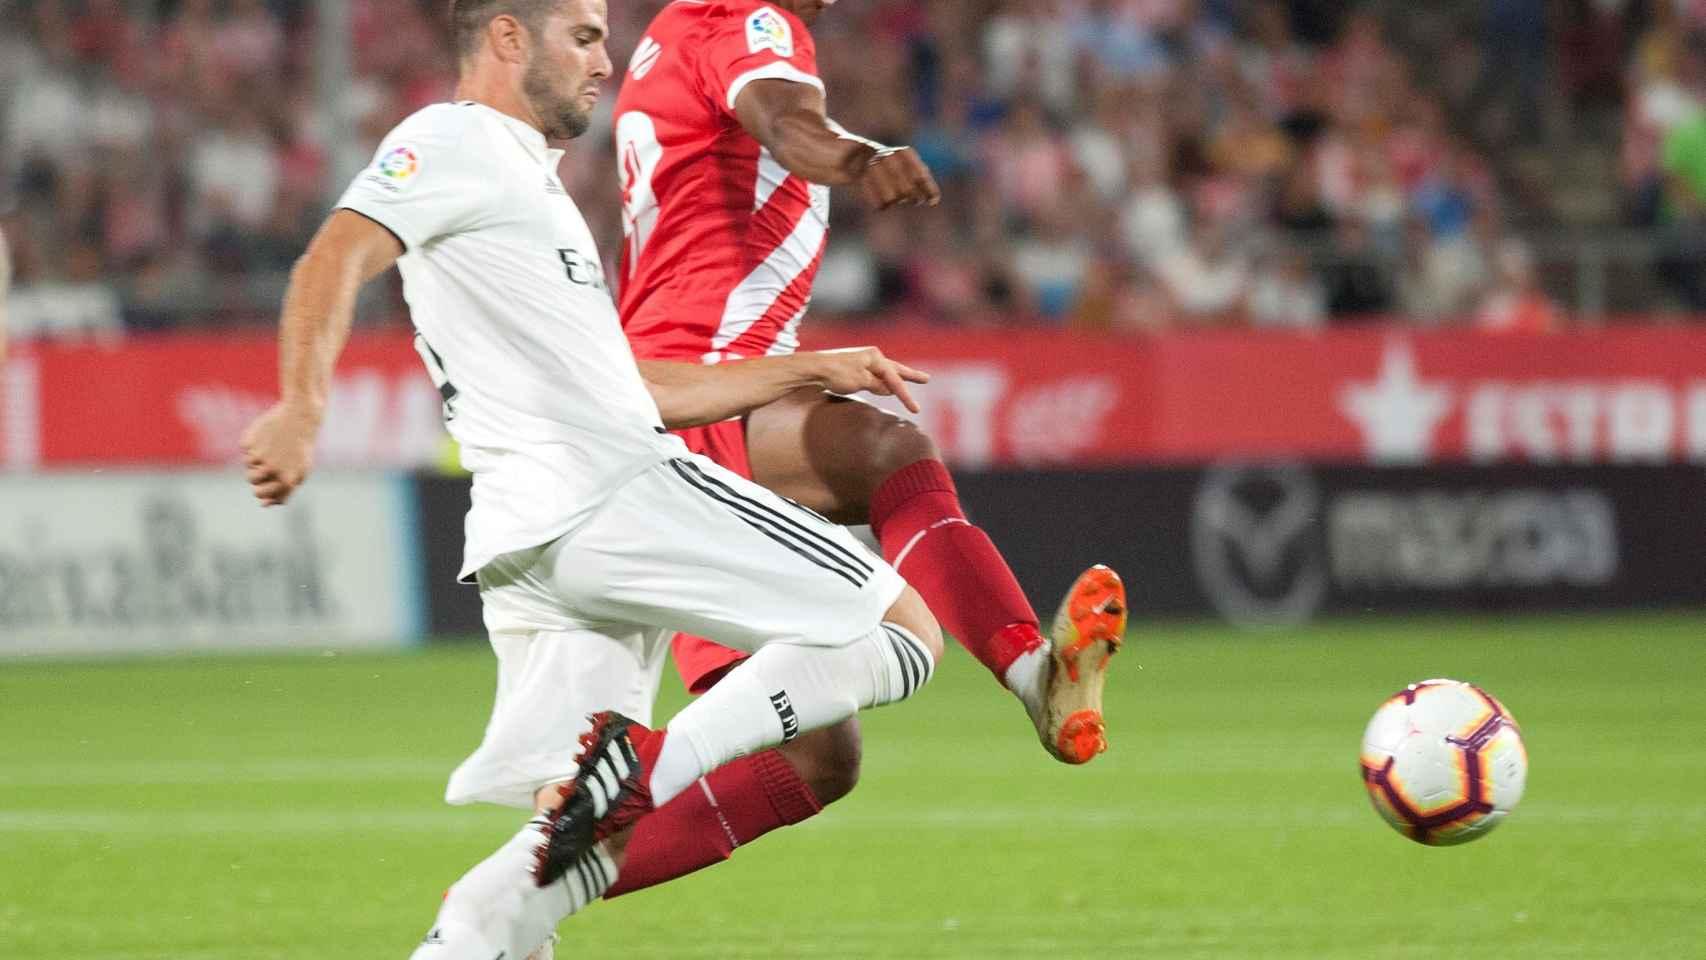 Nacho defiende un balón frente a un jugador del Girona